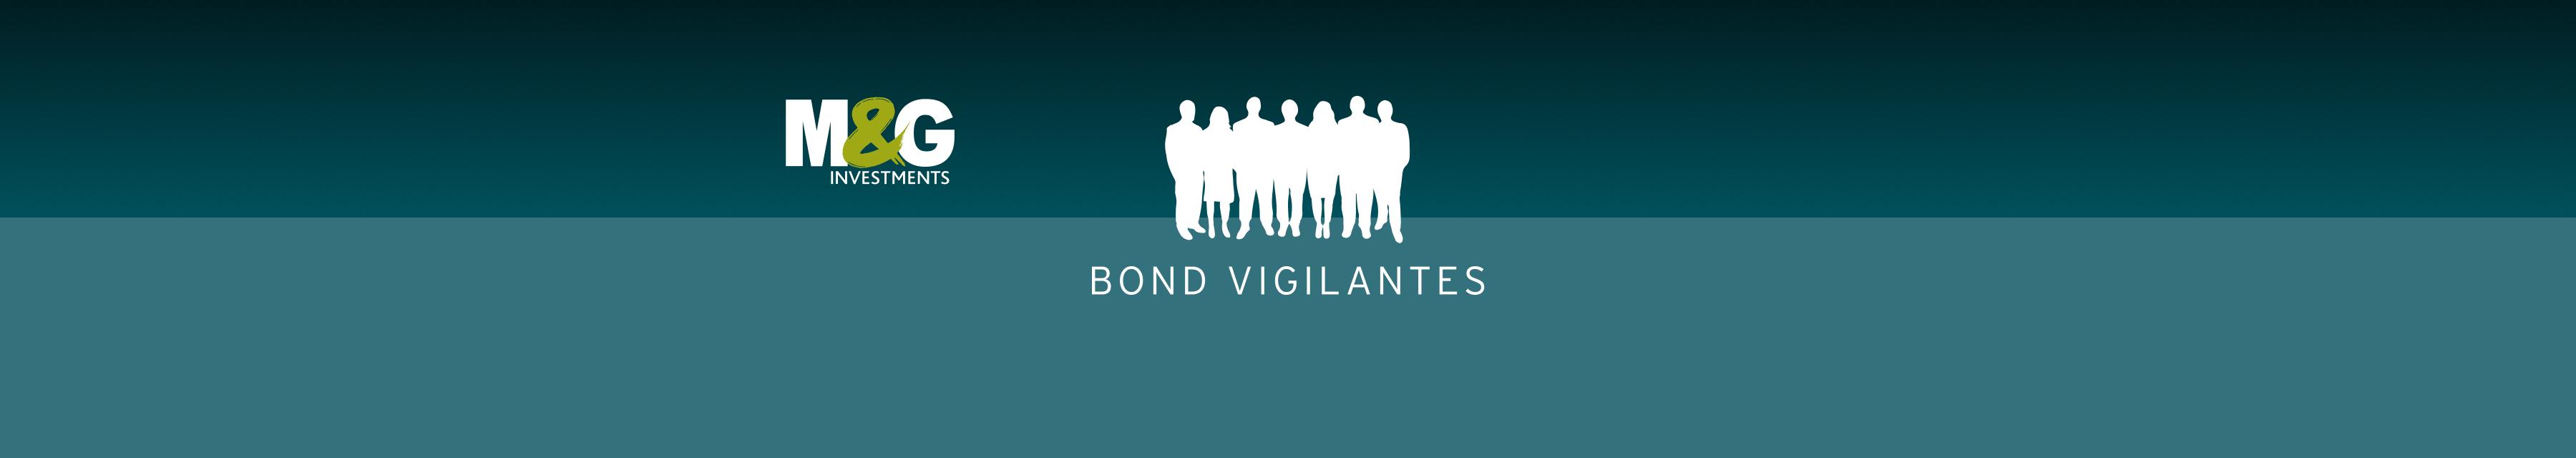 Bond Vigilantes